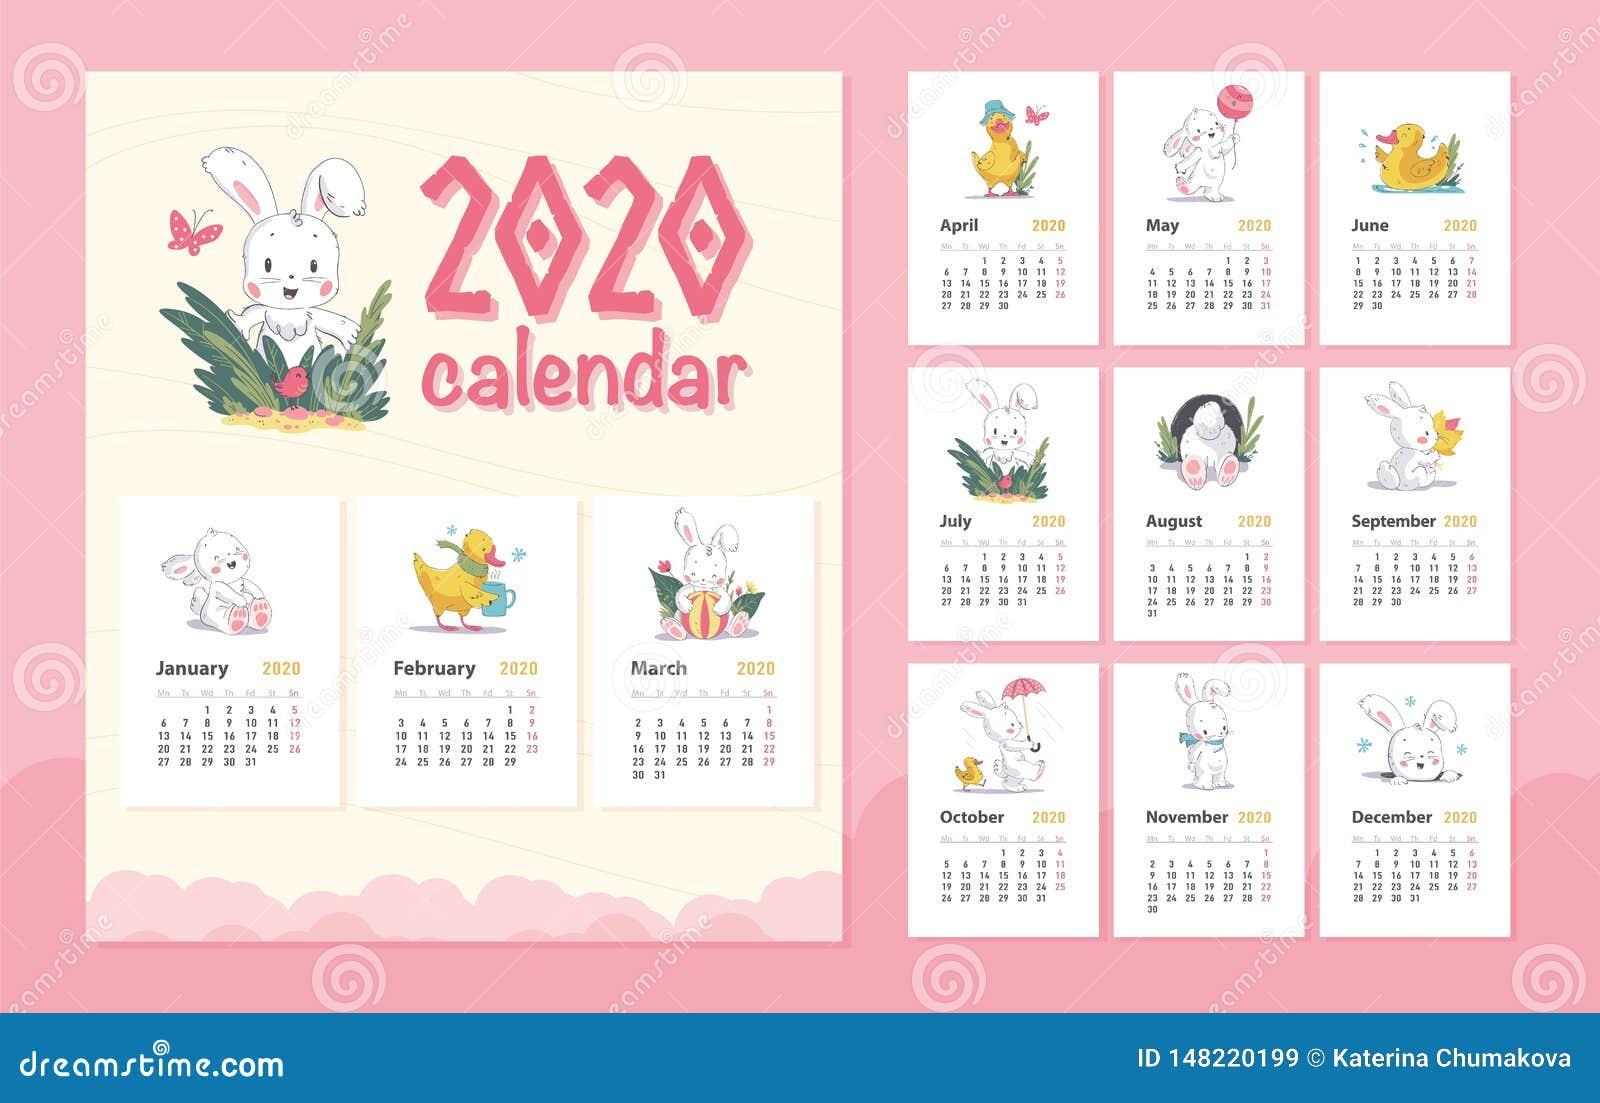 Vector 2020 Baby Calendar Design Template With Cute White Bunny